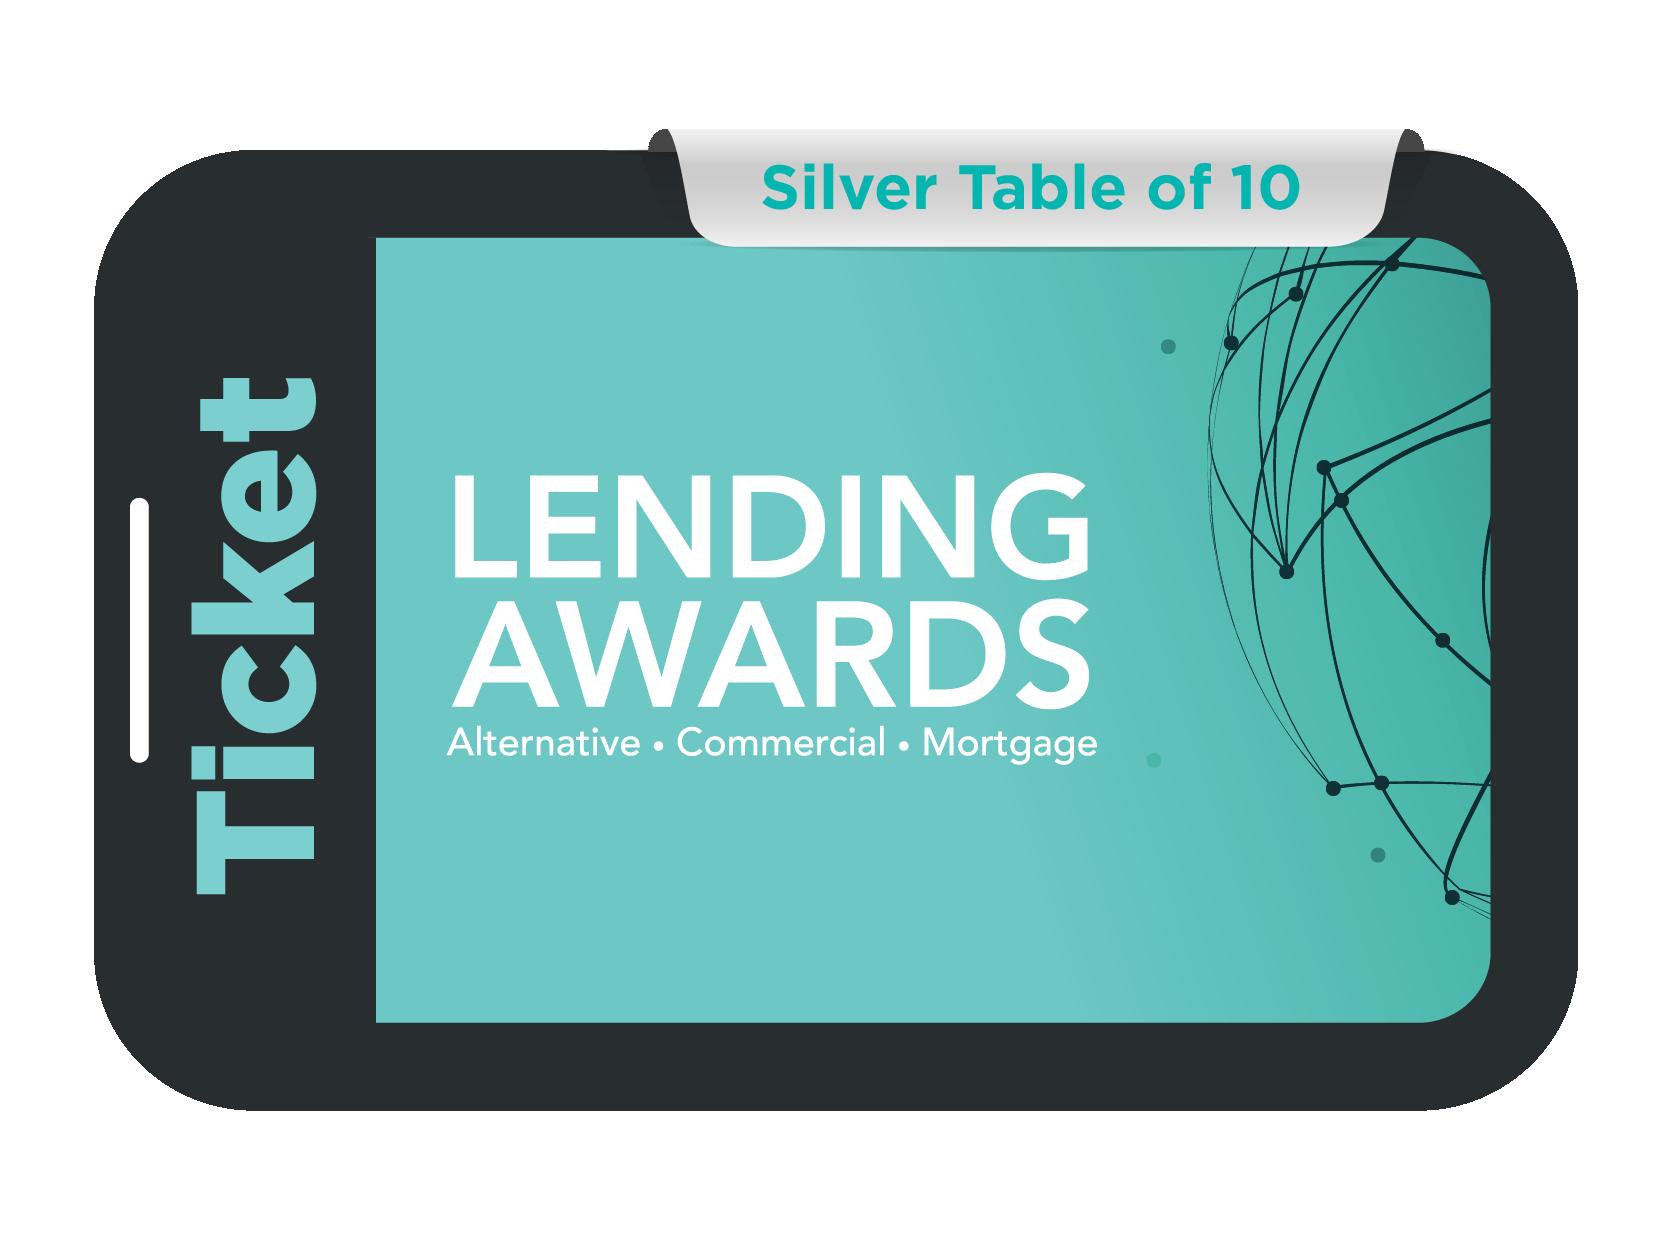 Silver Table of 10 - Lending Awards 2021